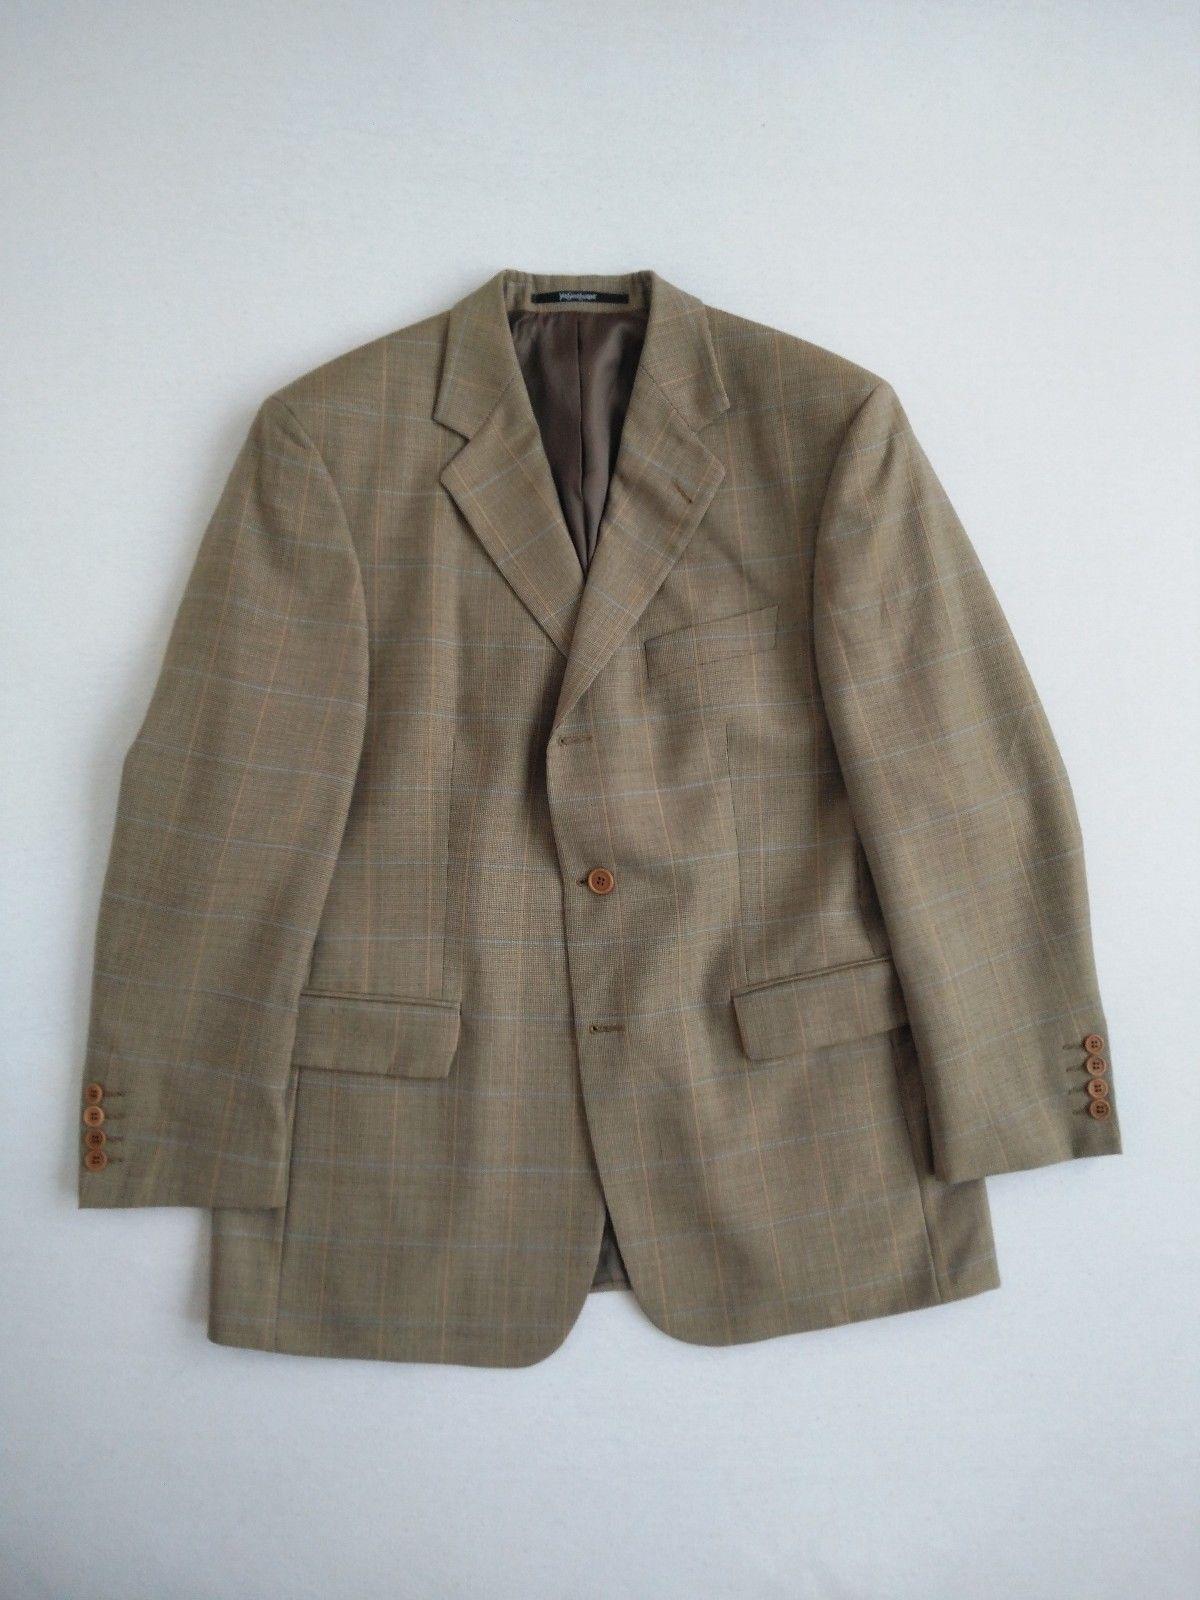 f5b58fb1ddb YVES SAINT LAURENT - YSL Pour Homme - Jacket Blazer - SZ 26 52 EU IT 42 US  UK (eBay Link)